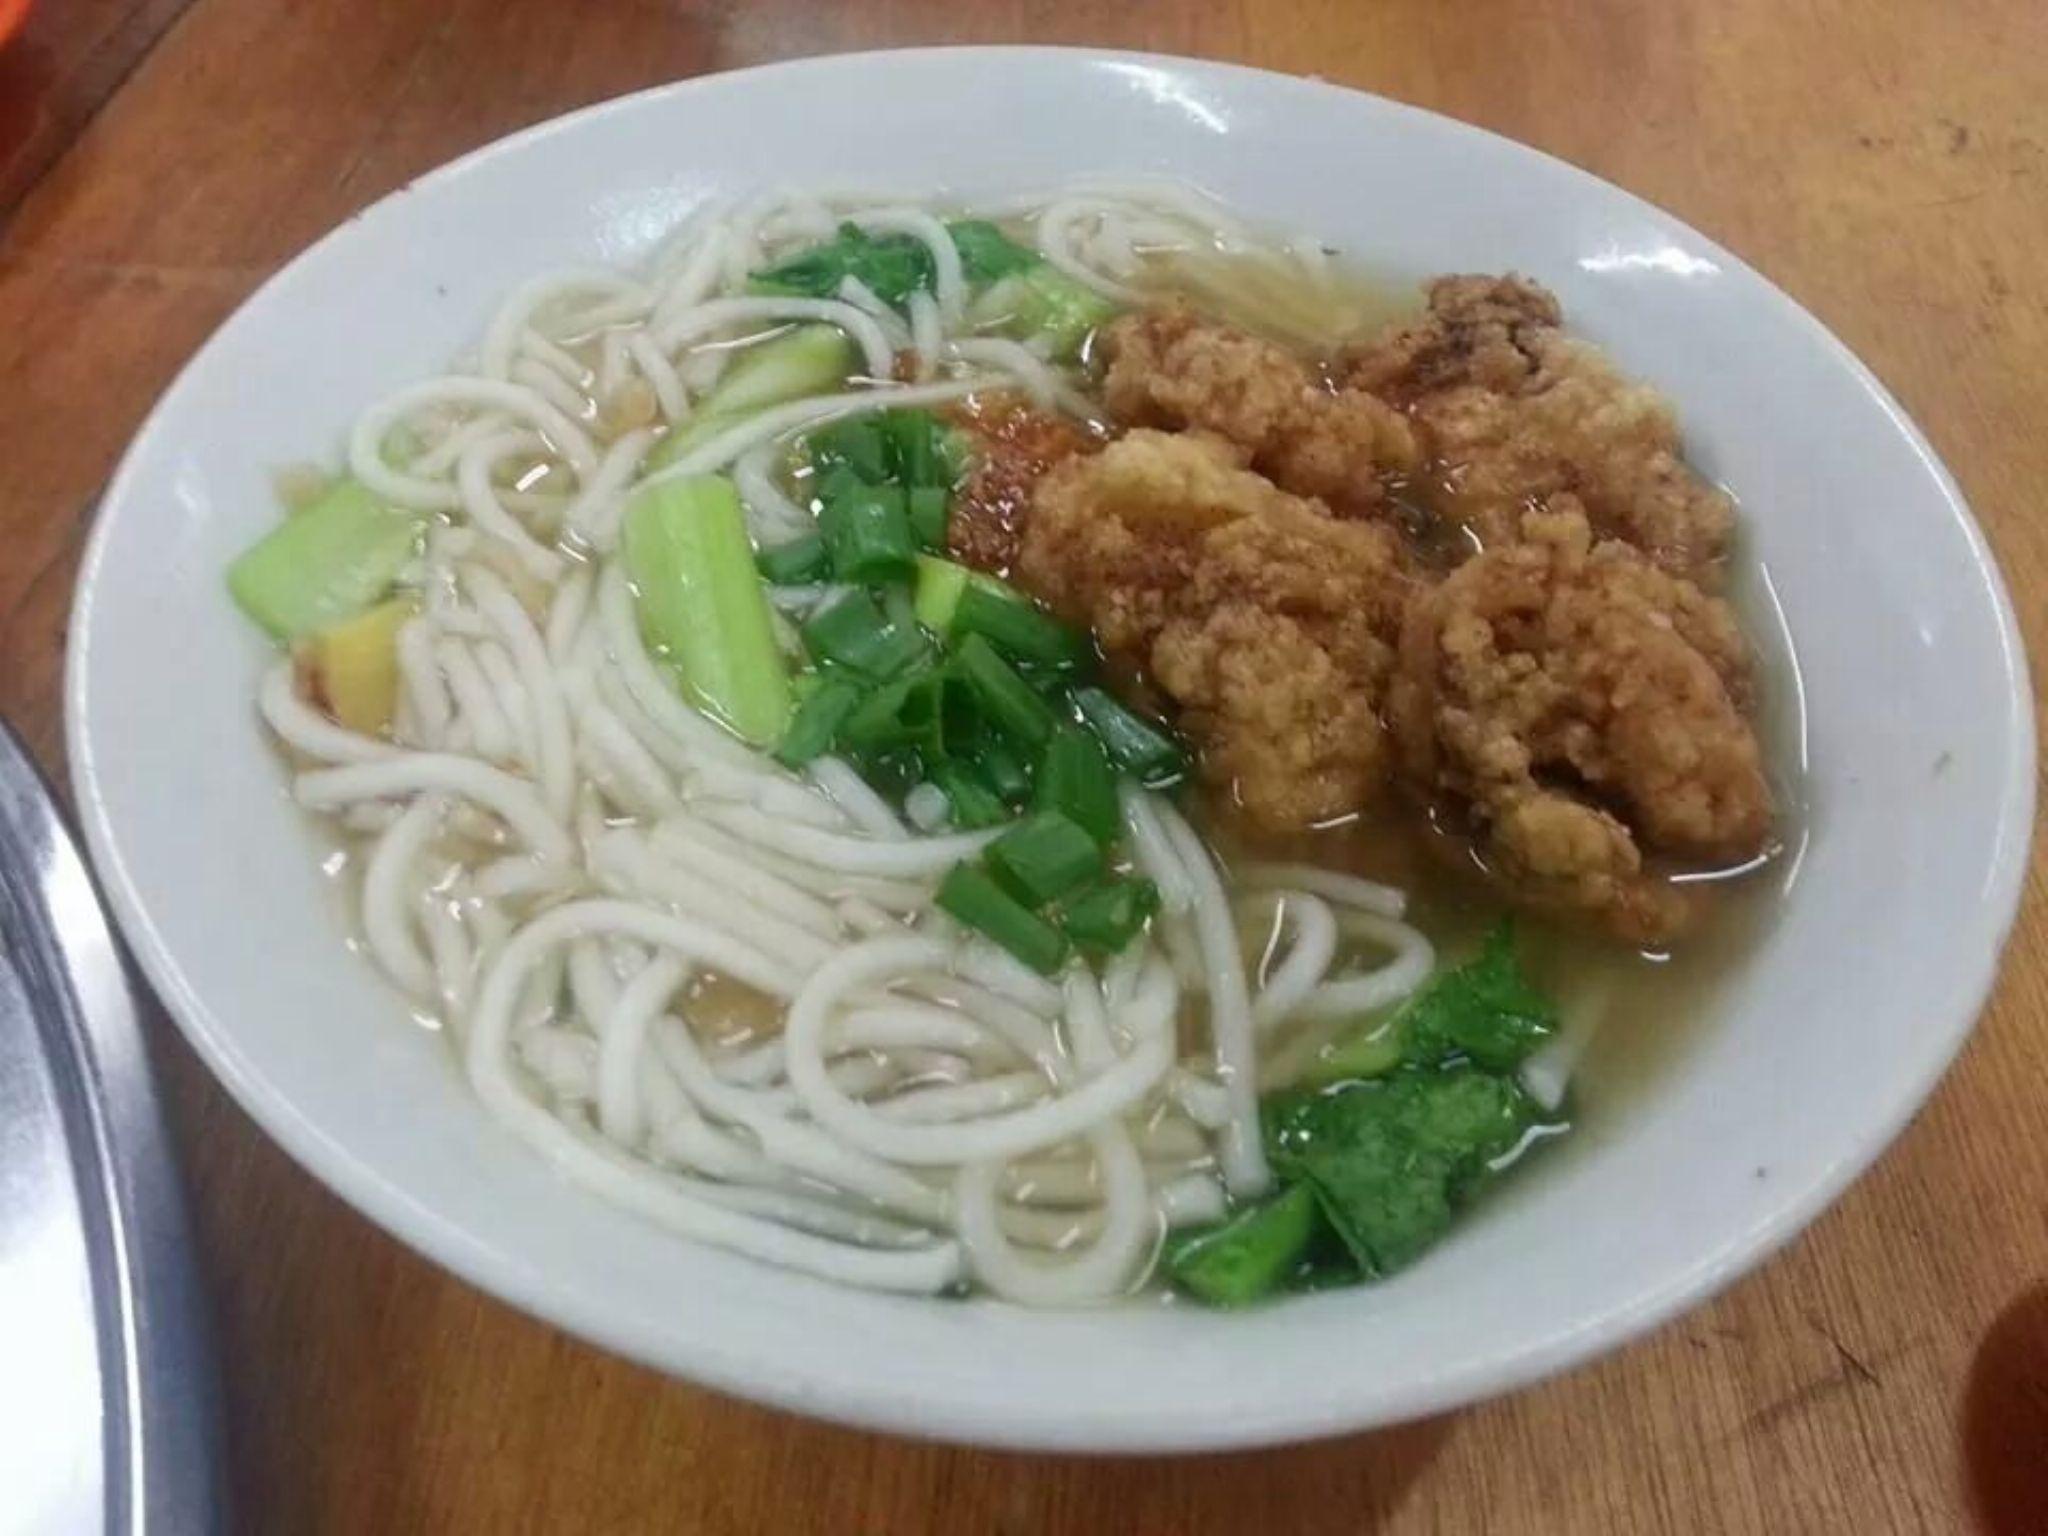 Fried fish meat noodles by stefnigel